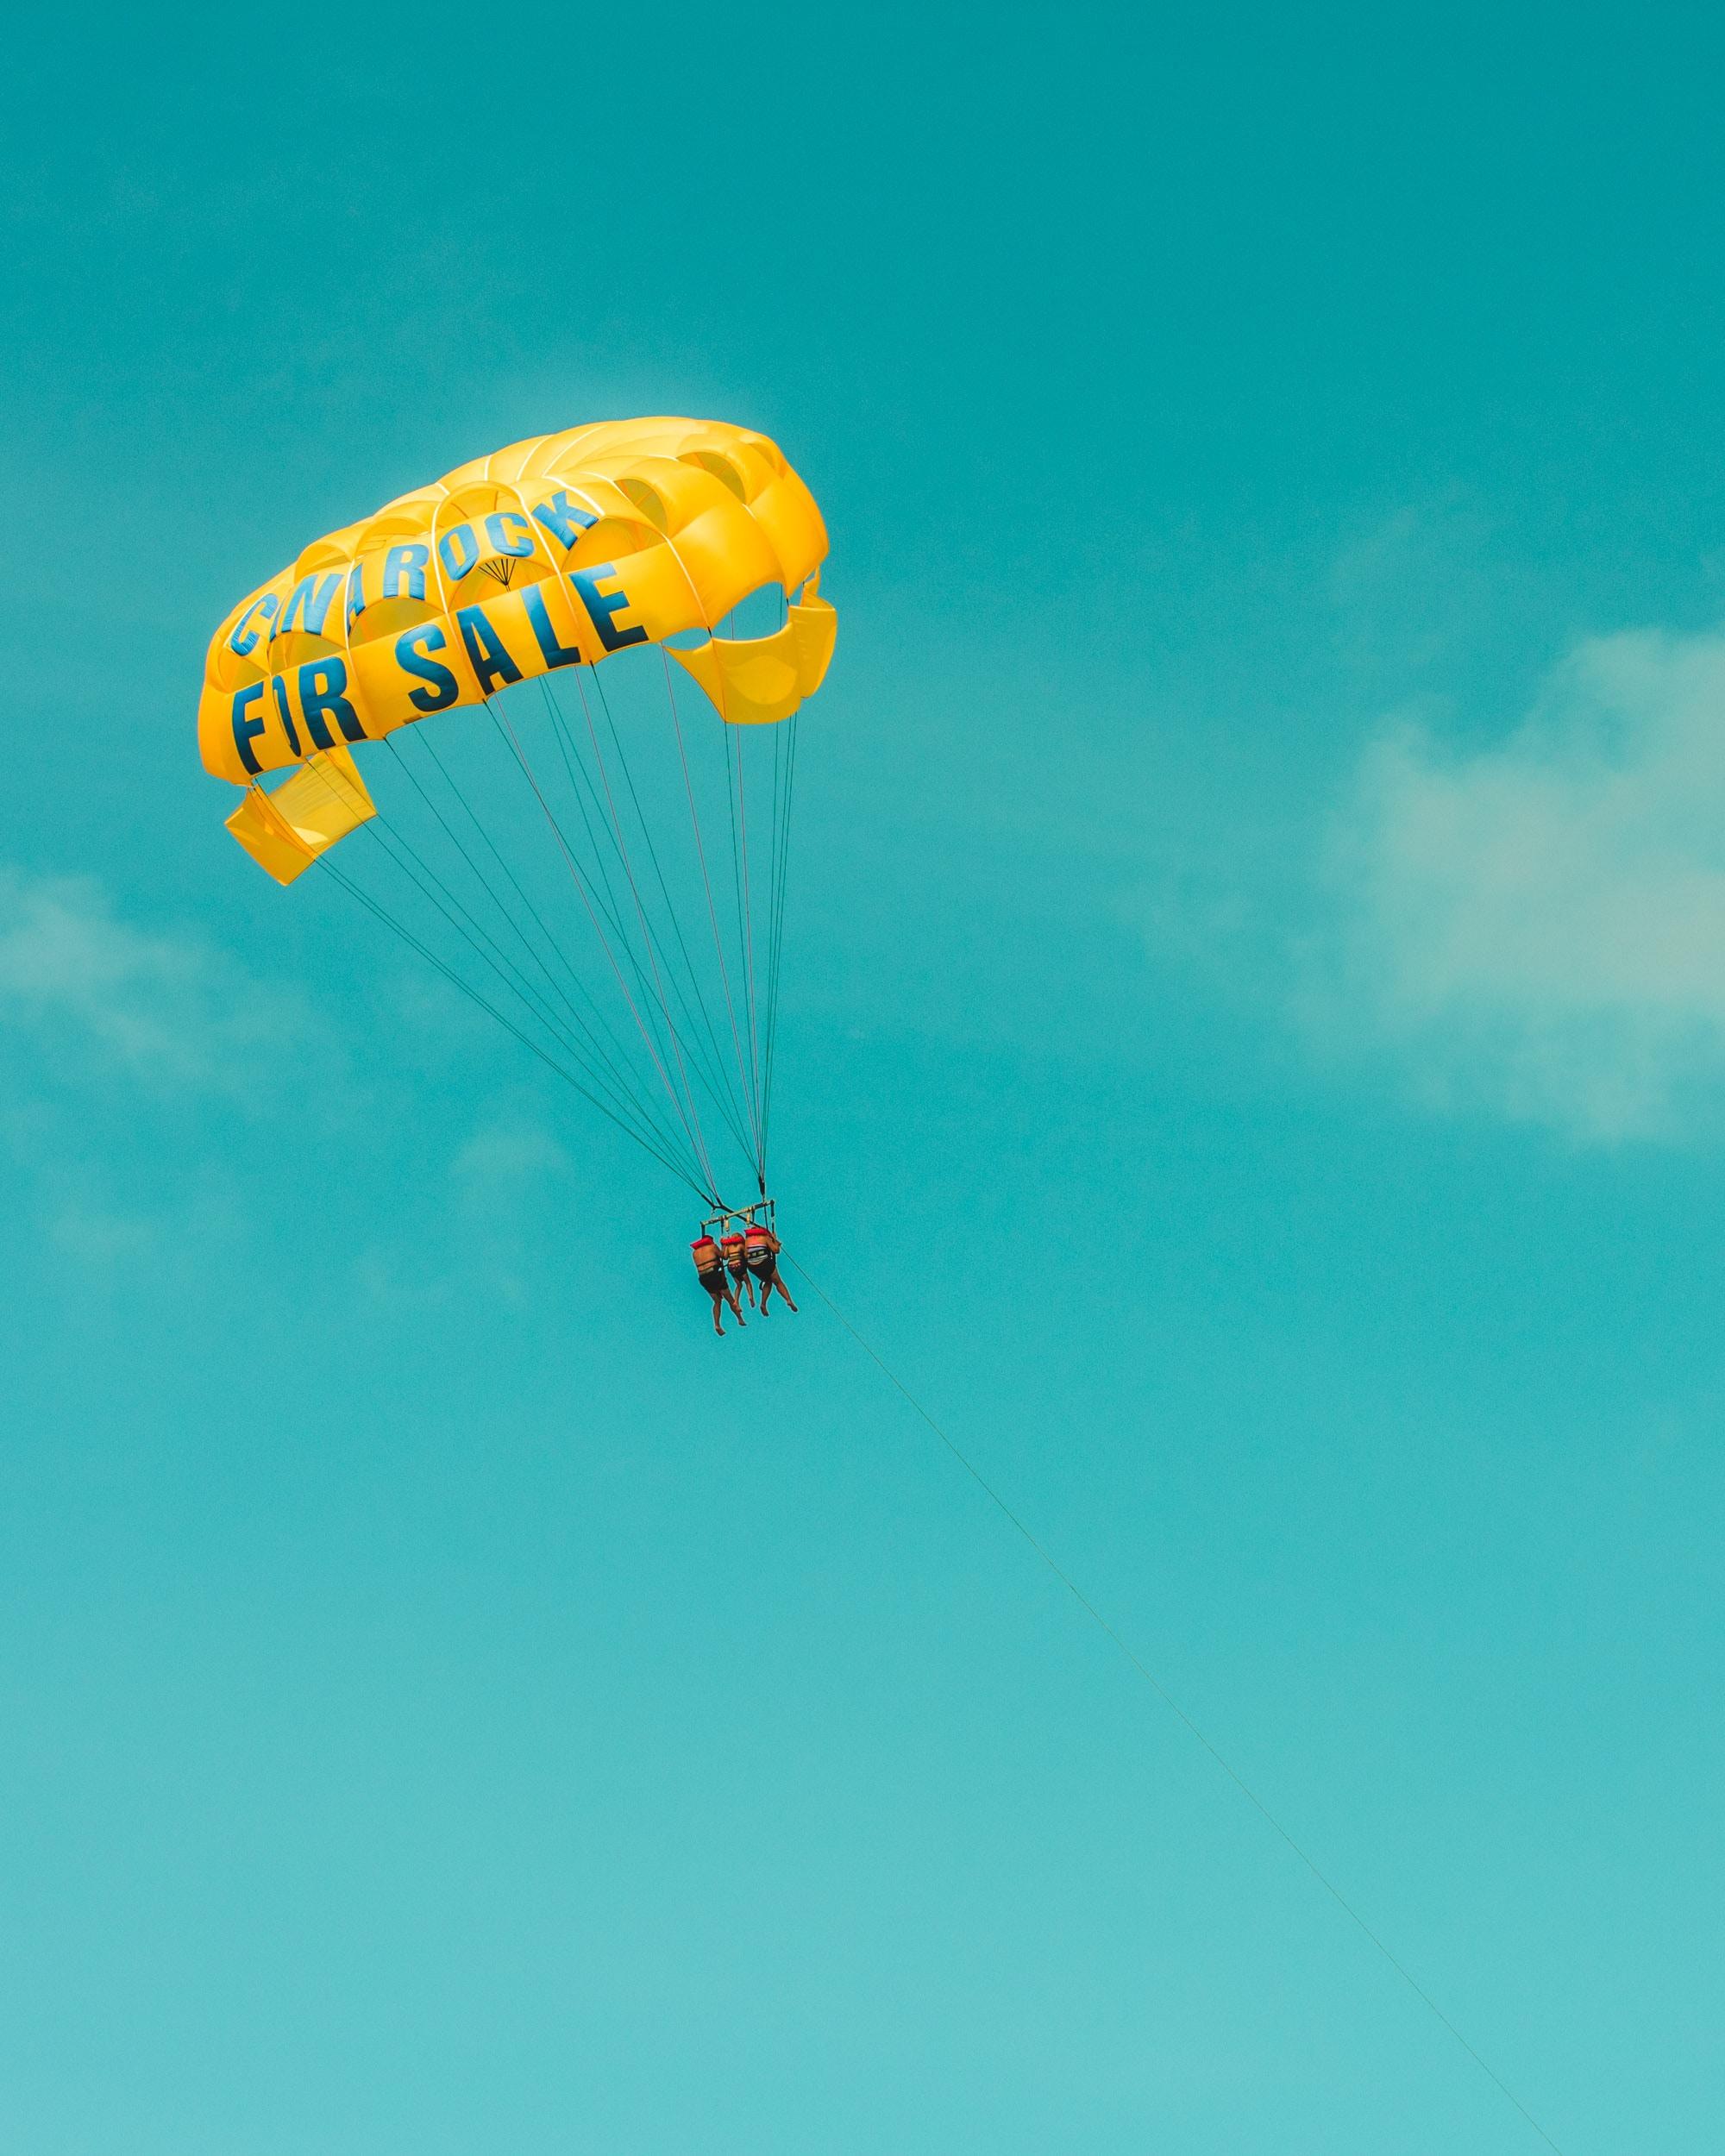 three person on yellow parachute